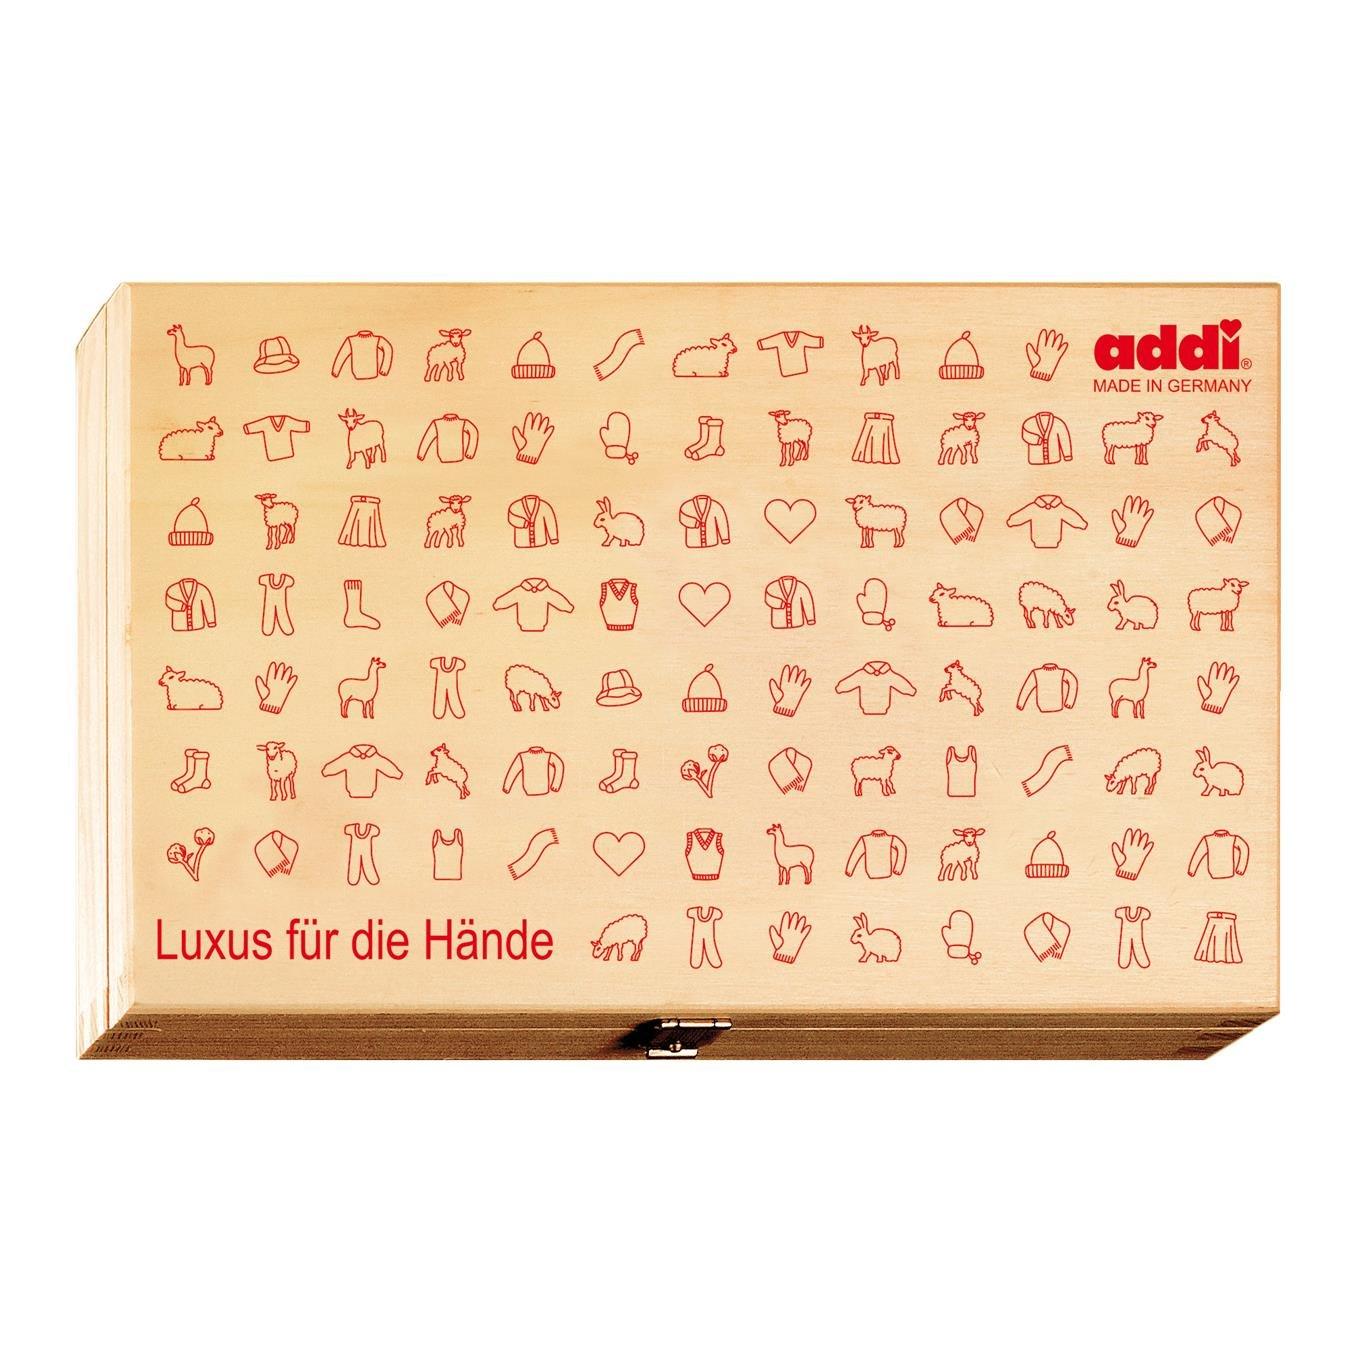 addi Wooden Circular Needle Storage Box